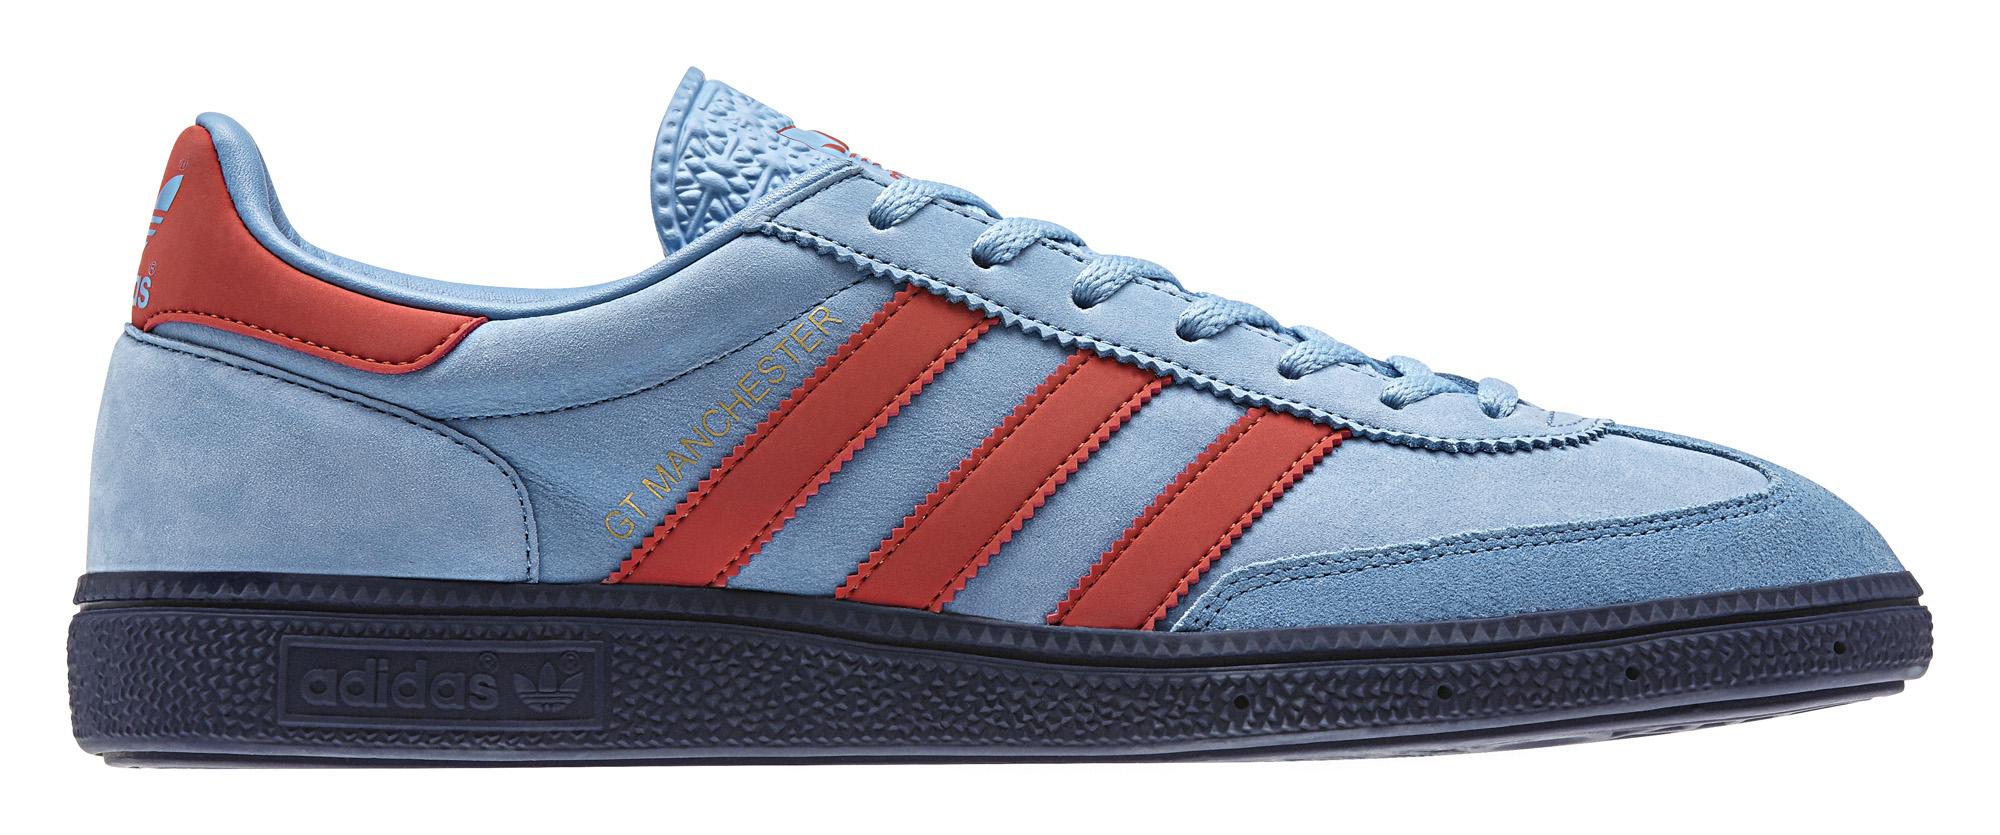 Adidas Spezial Manchester Profile